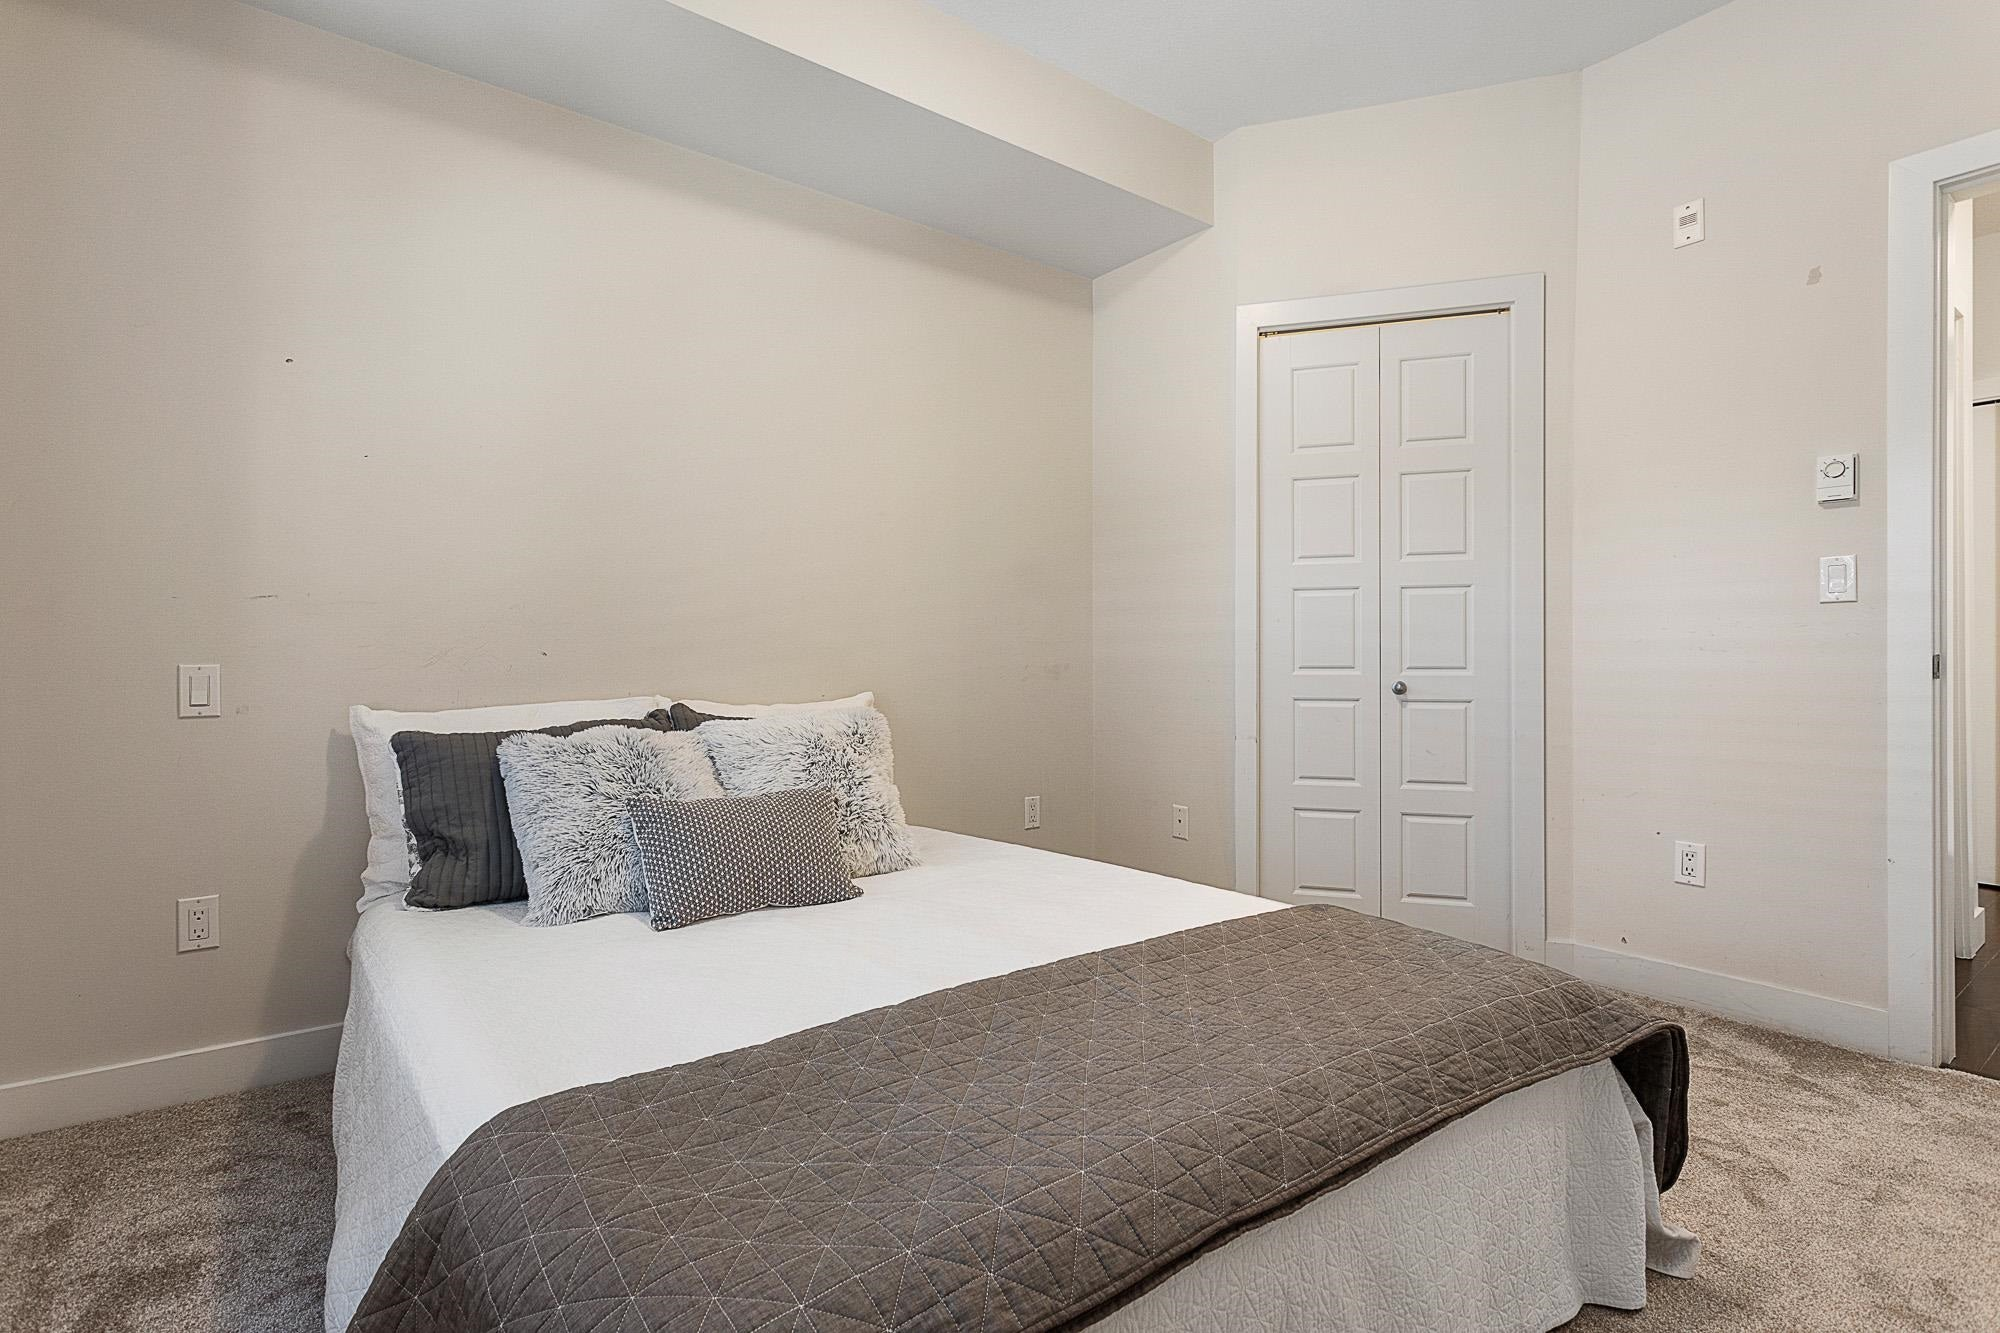 114 20219 54A AVENUE - Langley City Apartment/Condo for sale, 1 Bedroom (R2616172) - #18